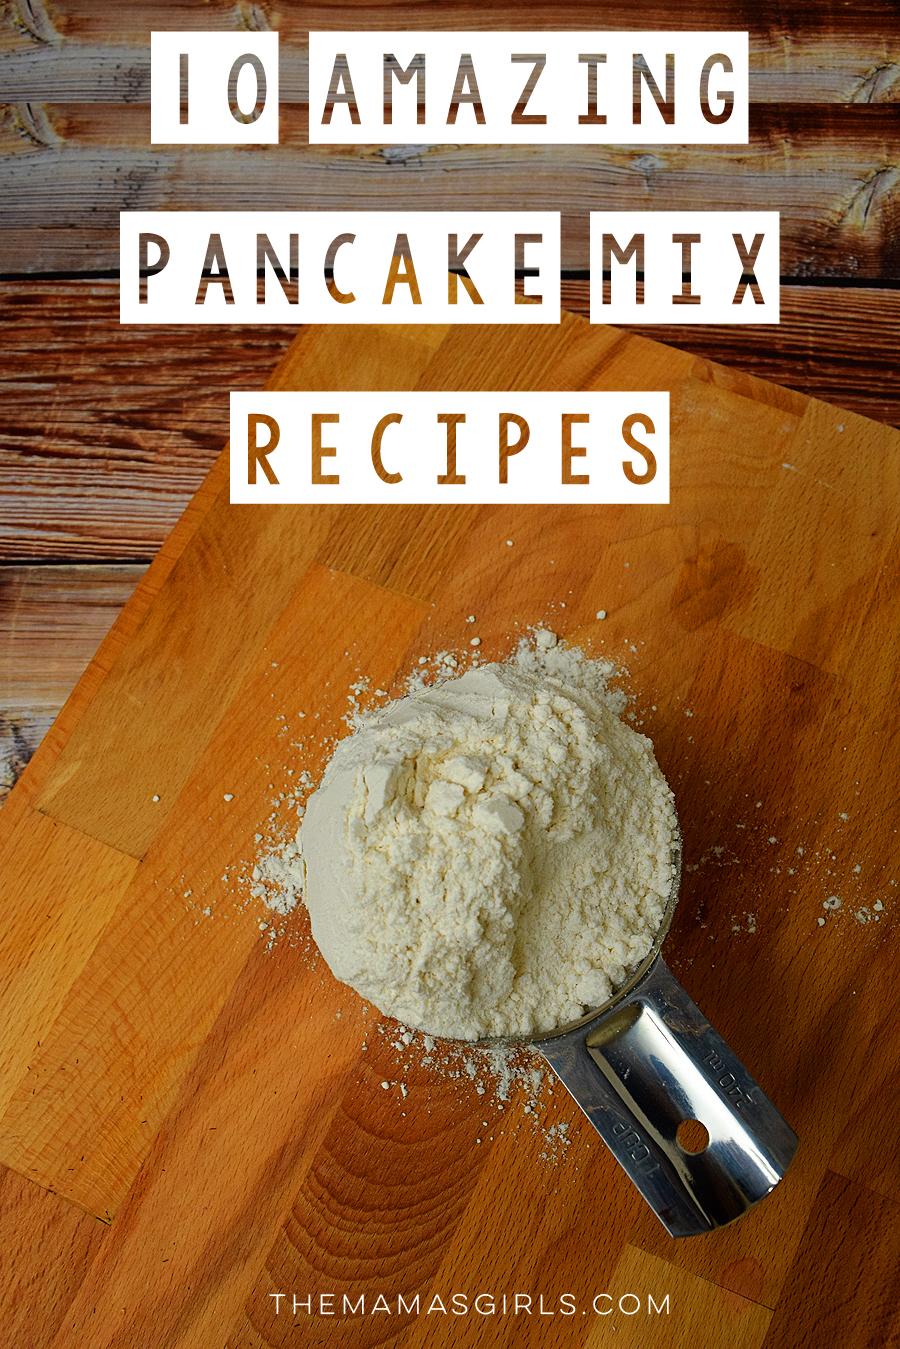 10 Amazing Pancake Mix Recipes